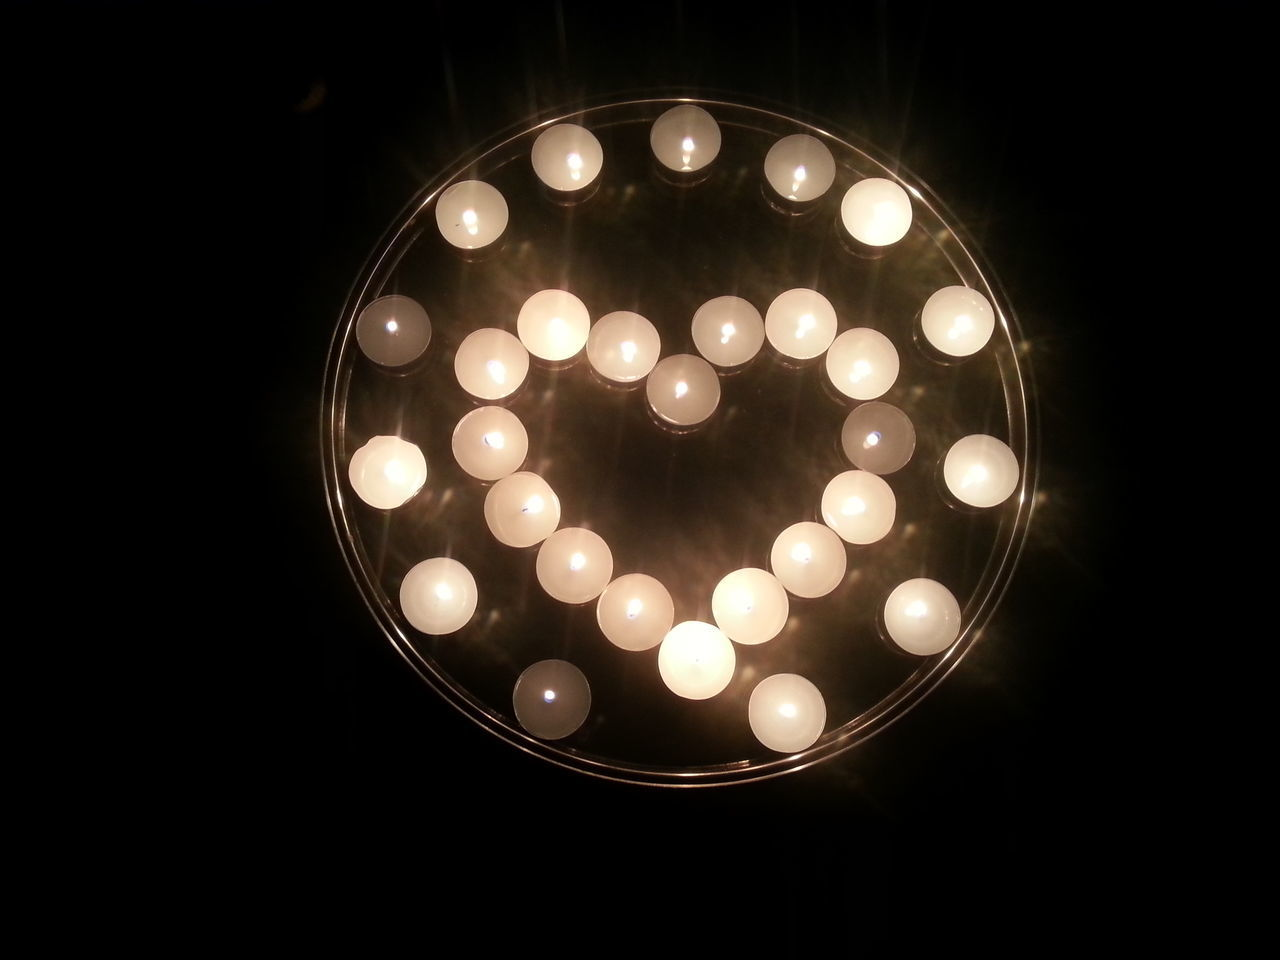 Circle Darkness And Light Heart Shape Illuminated Indoors  Shinee Shiny Shine Silver Plate Tealights